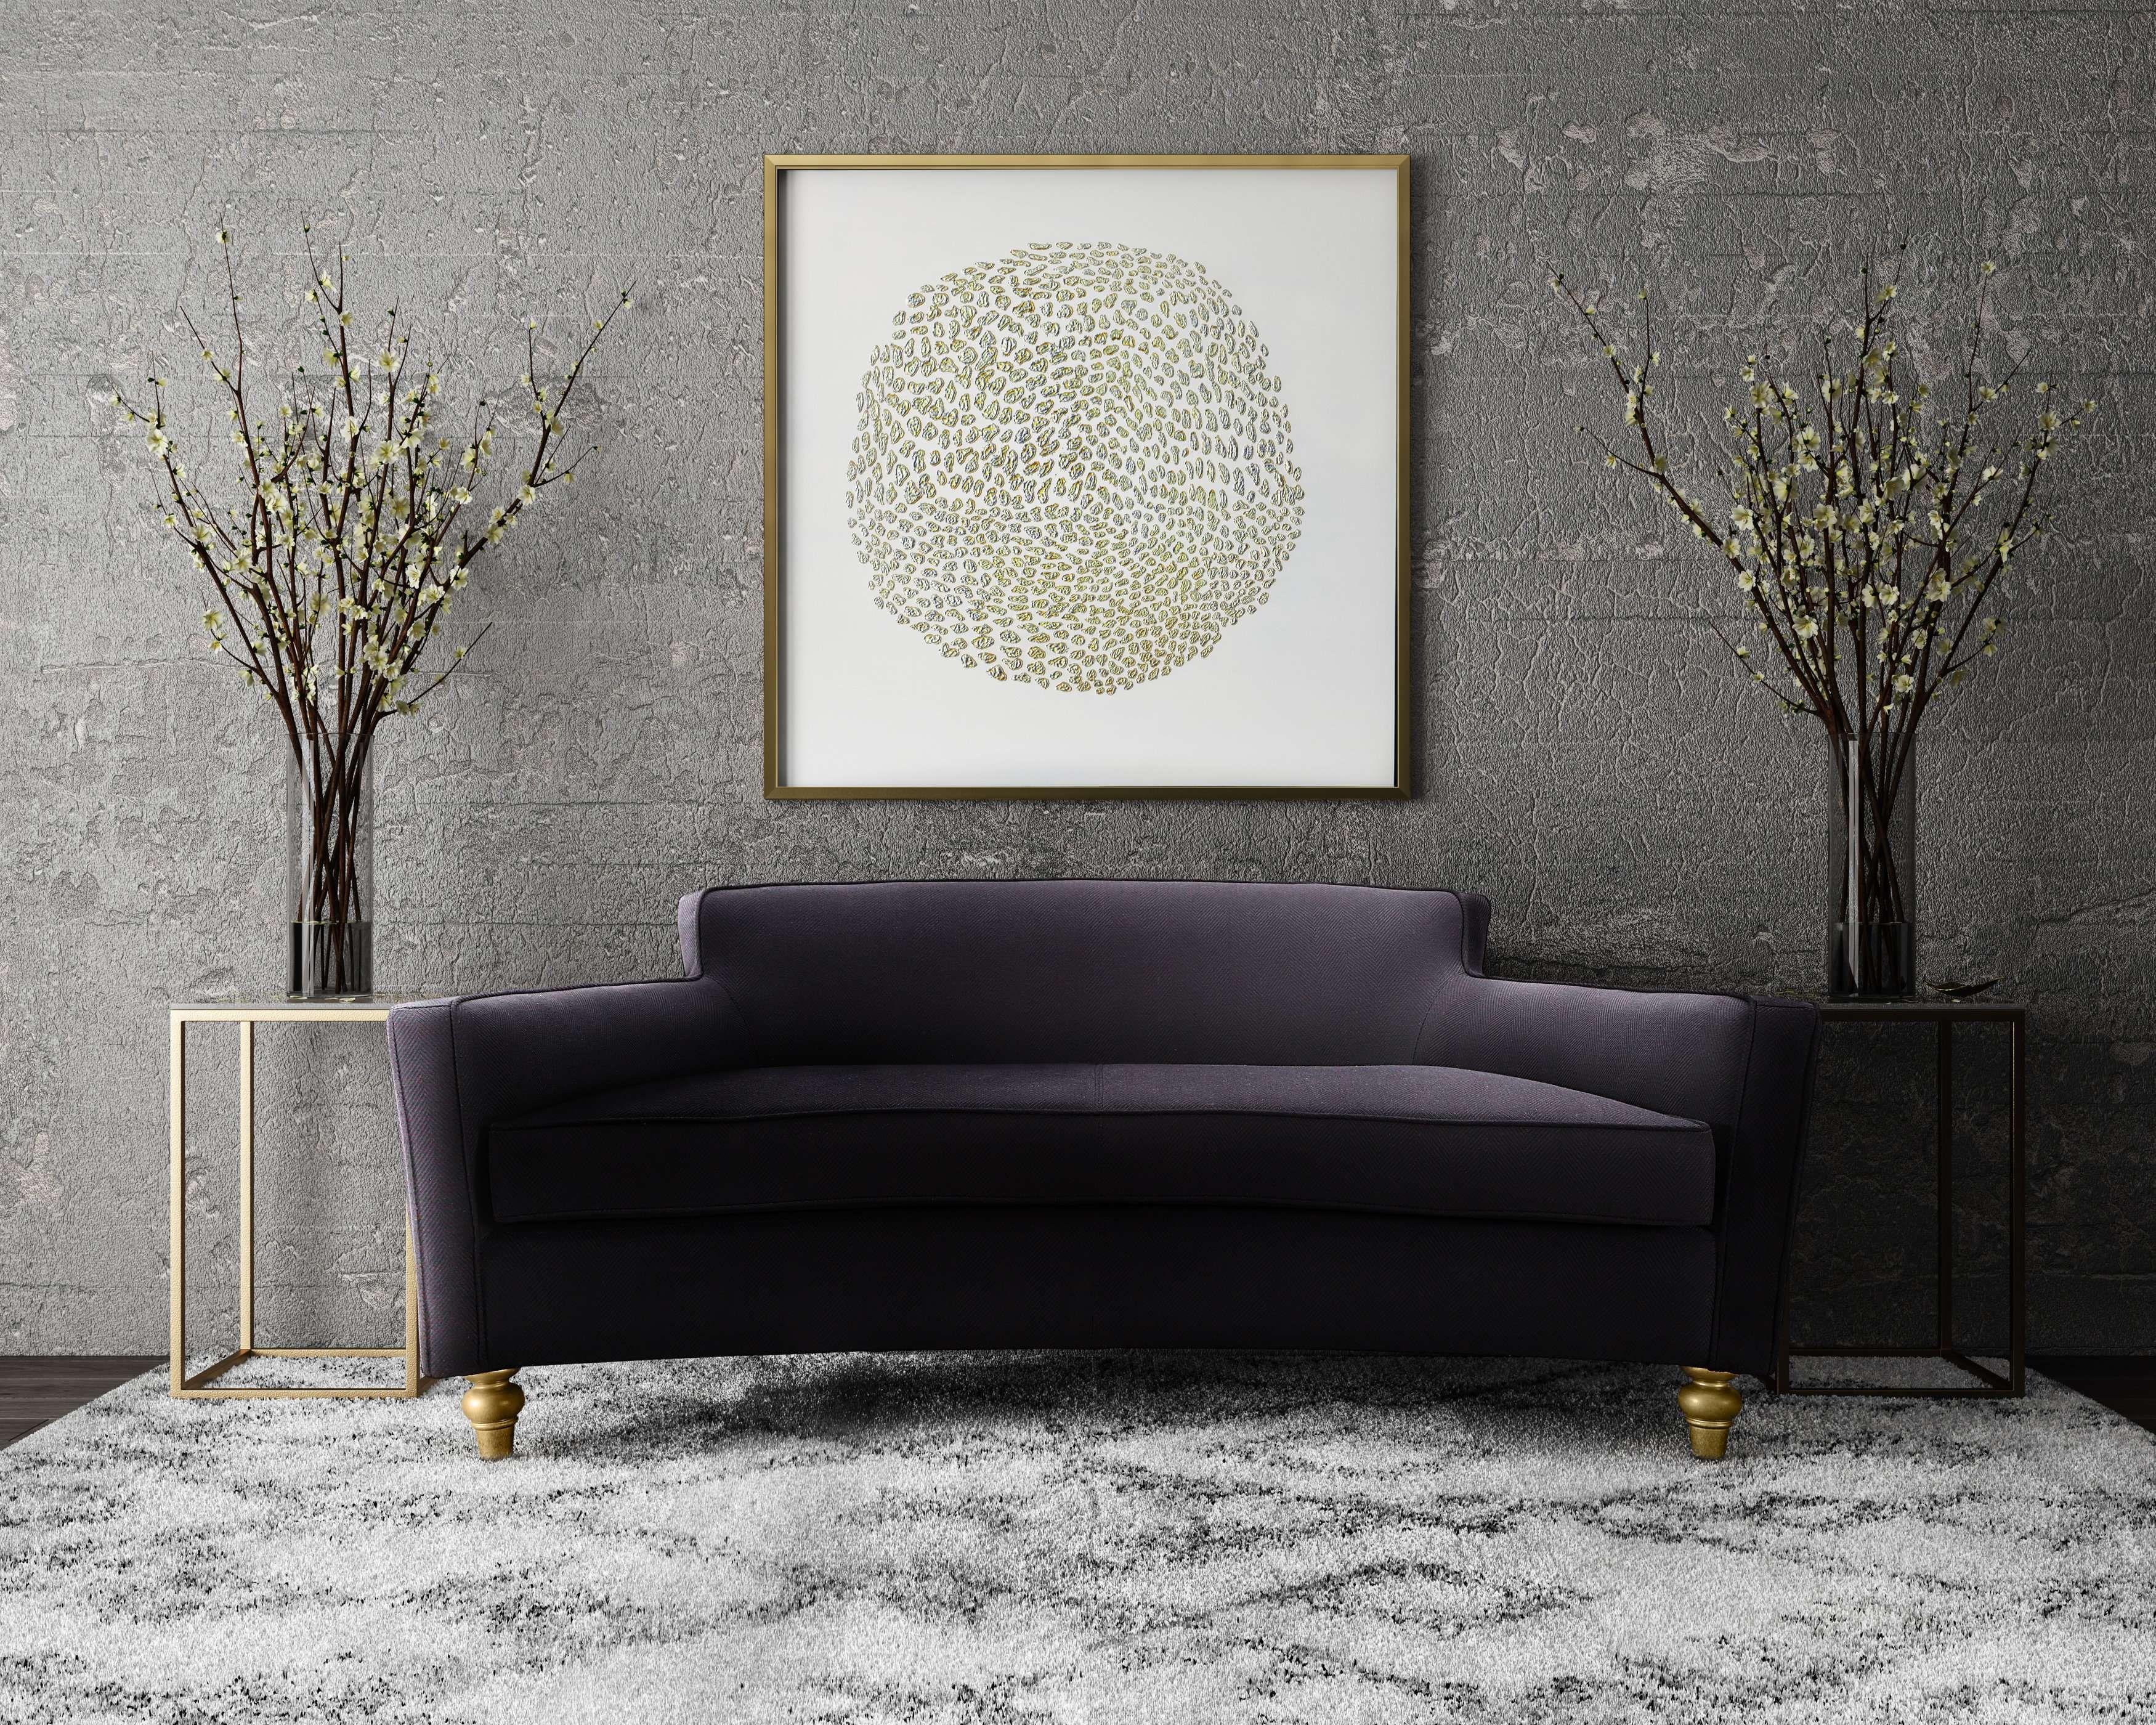 Lowest Price On Tov Furniture Oslo Black Herringbone Sofa Tov L6109 Shop Today Furniture Coffee Table Glam Living Room